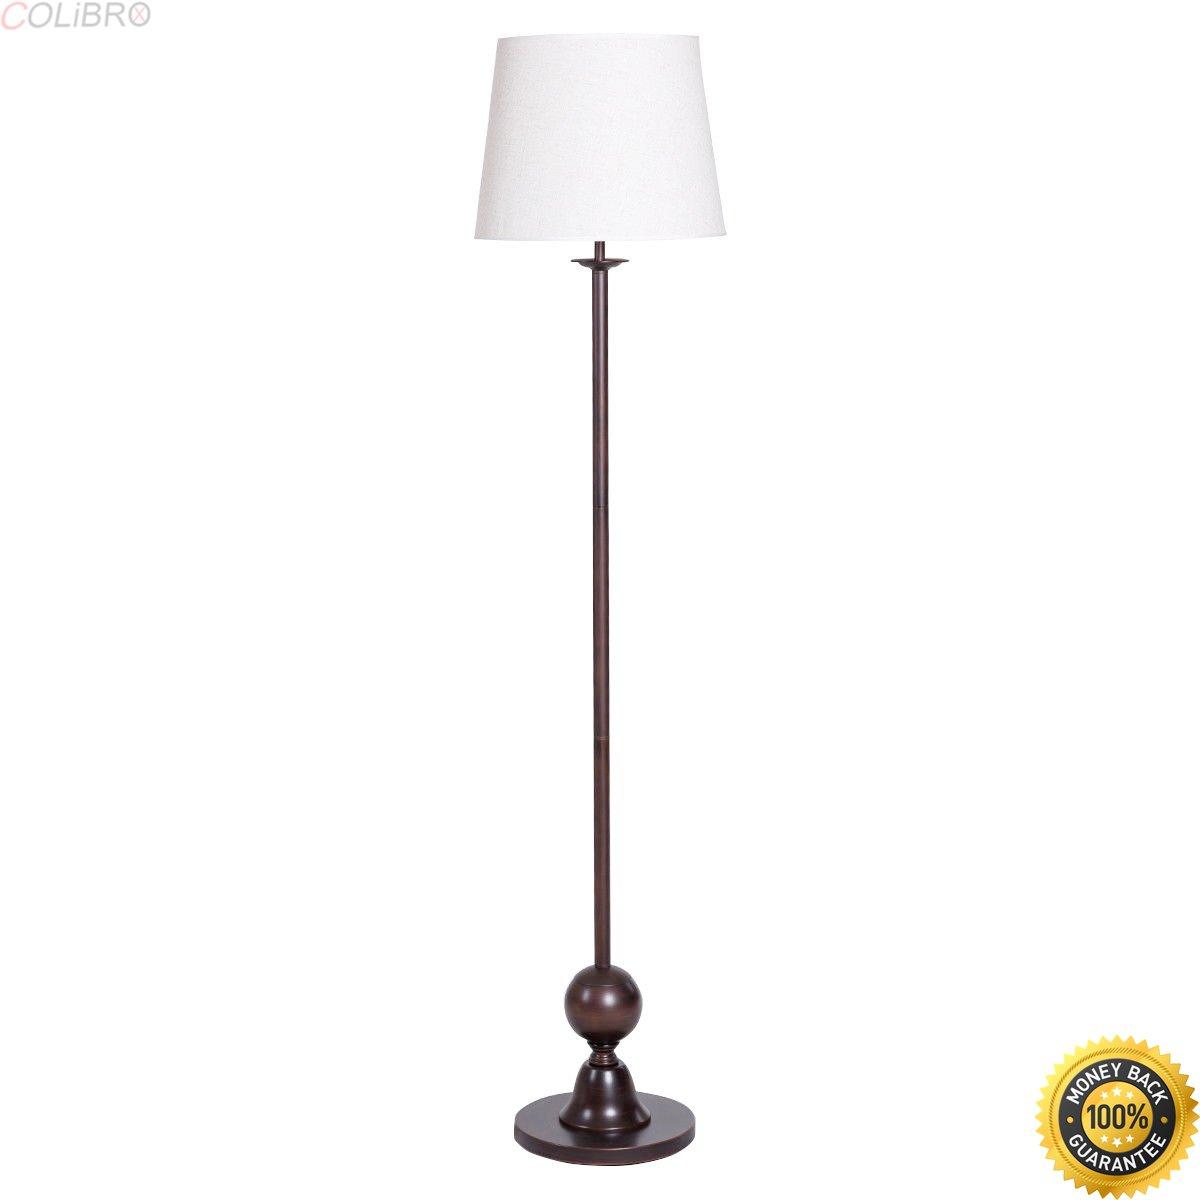 Pleasing Colibrox 66 5 Copper Bronze Drum Shade Floor Lamp Lighting Download Free Architecture Designs Crovemadebymaigaardcom